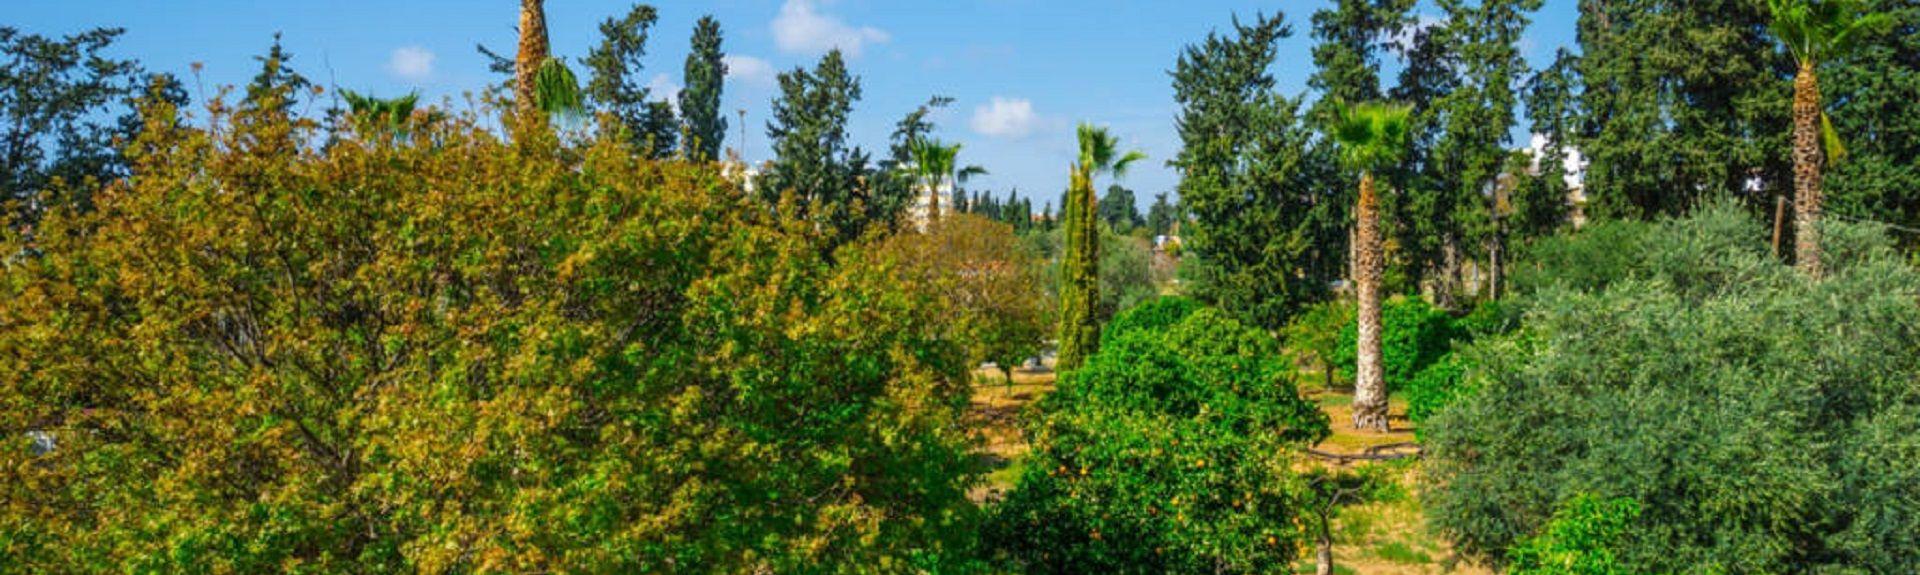 Neapolis, Γεροσκήπου, Πάφος, Κύπρος